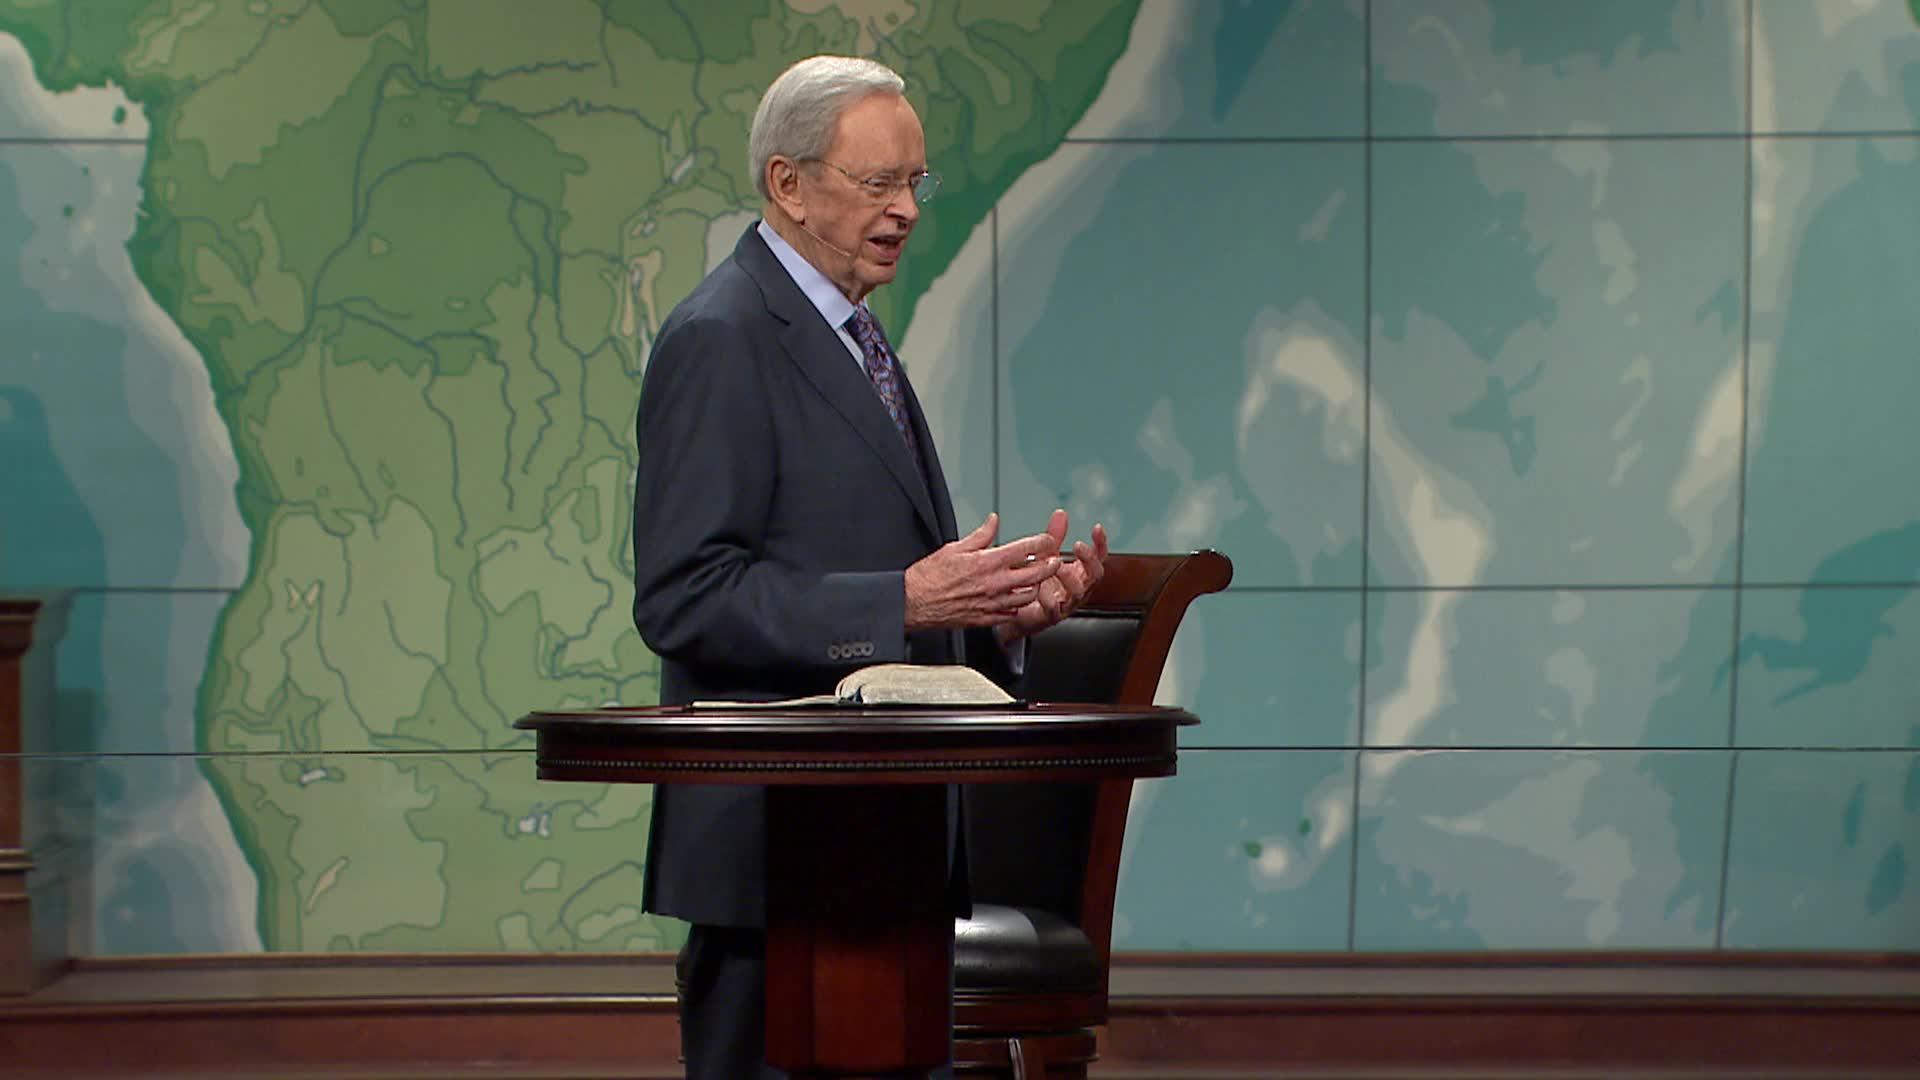 Does God Verbally Speak to Me? | Desiring God